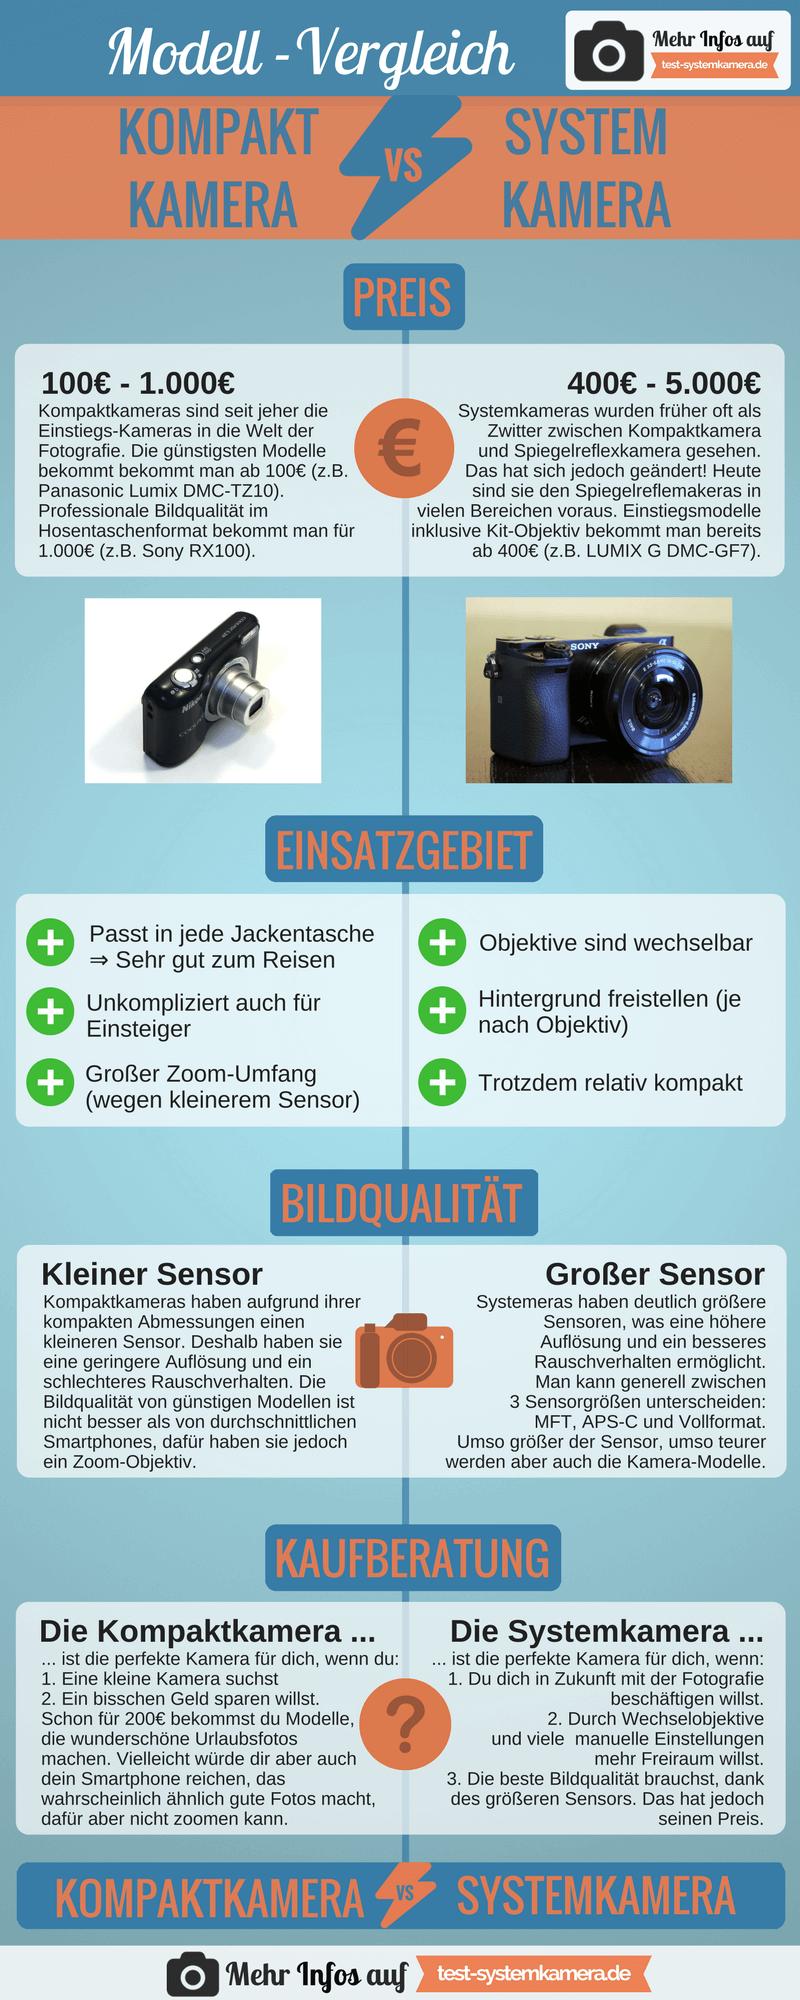 Systemkamera Oder Kompaktkamera Der Grosse Vergleich 2021 Kompaktkamera Systemkamera Kamera